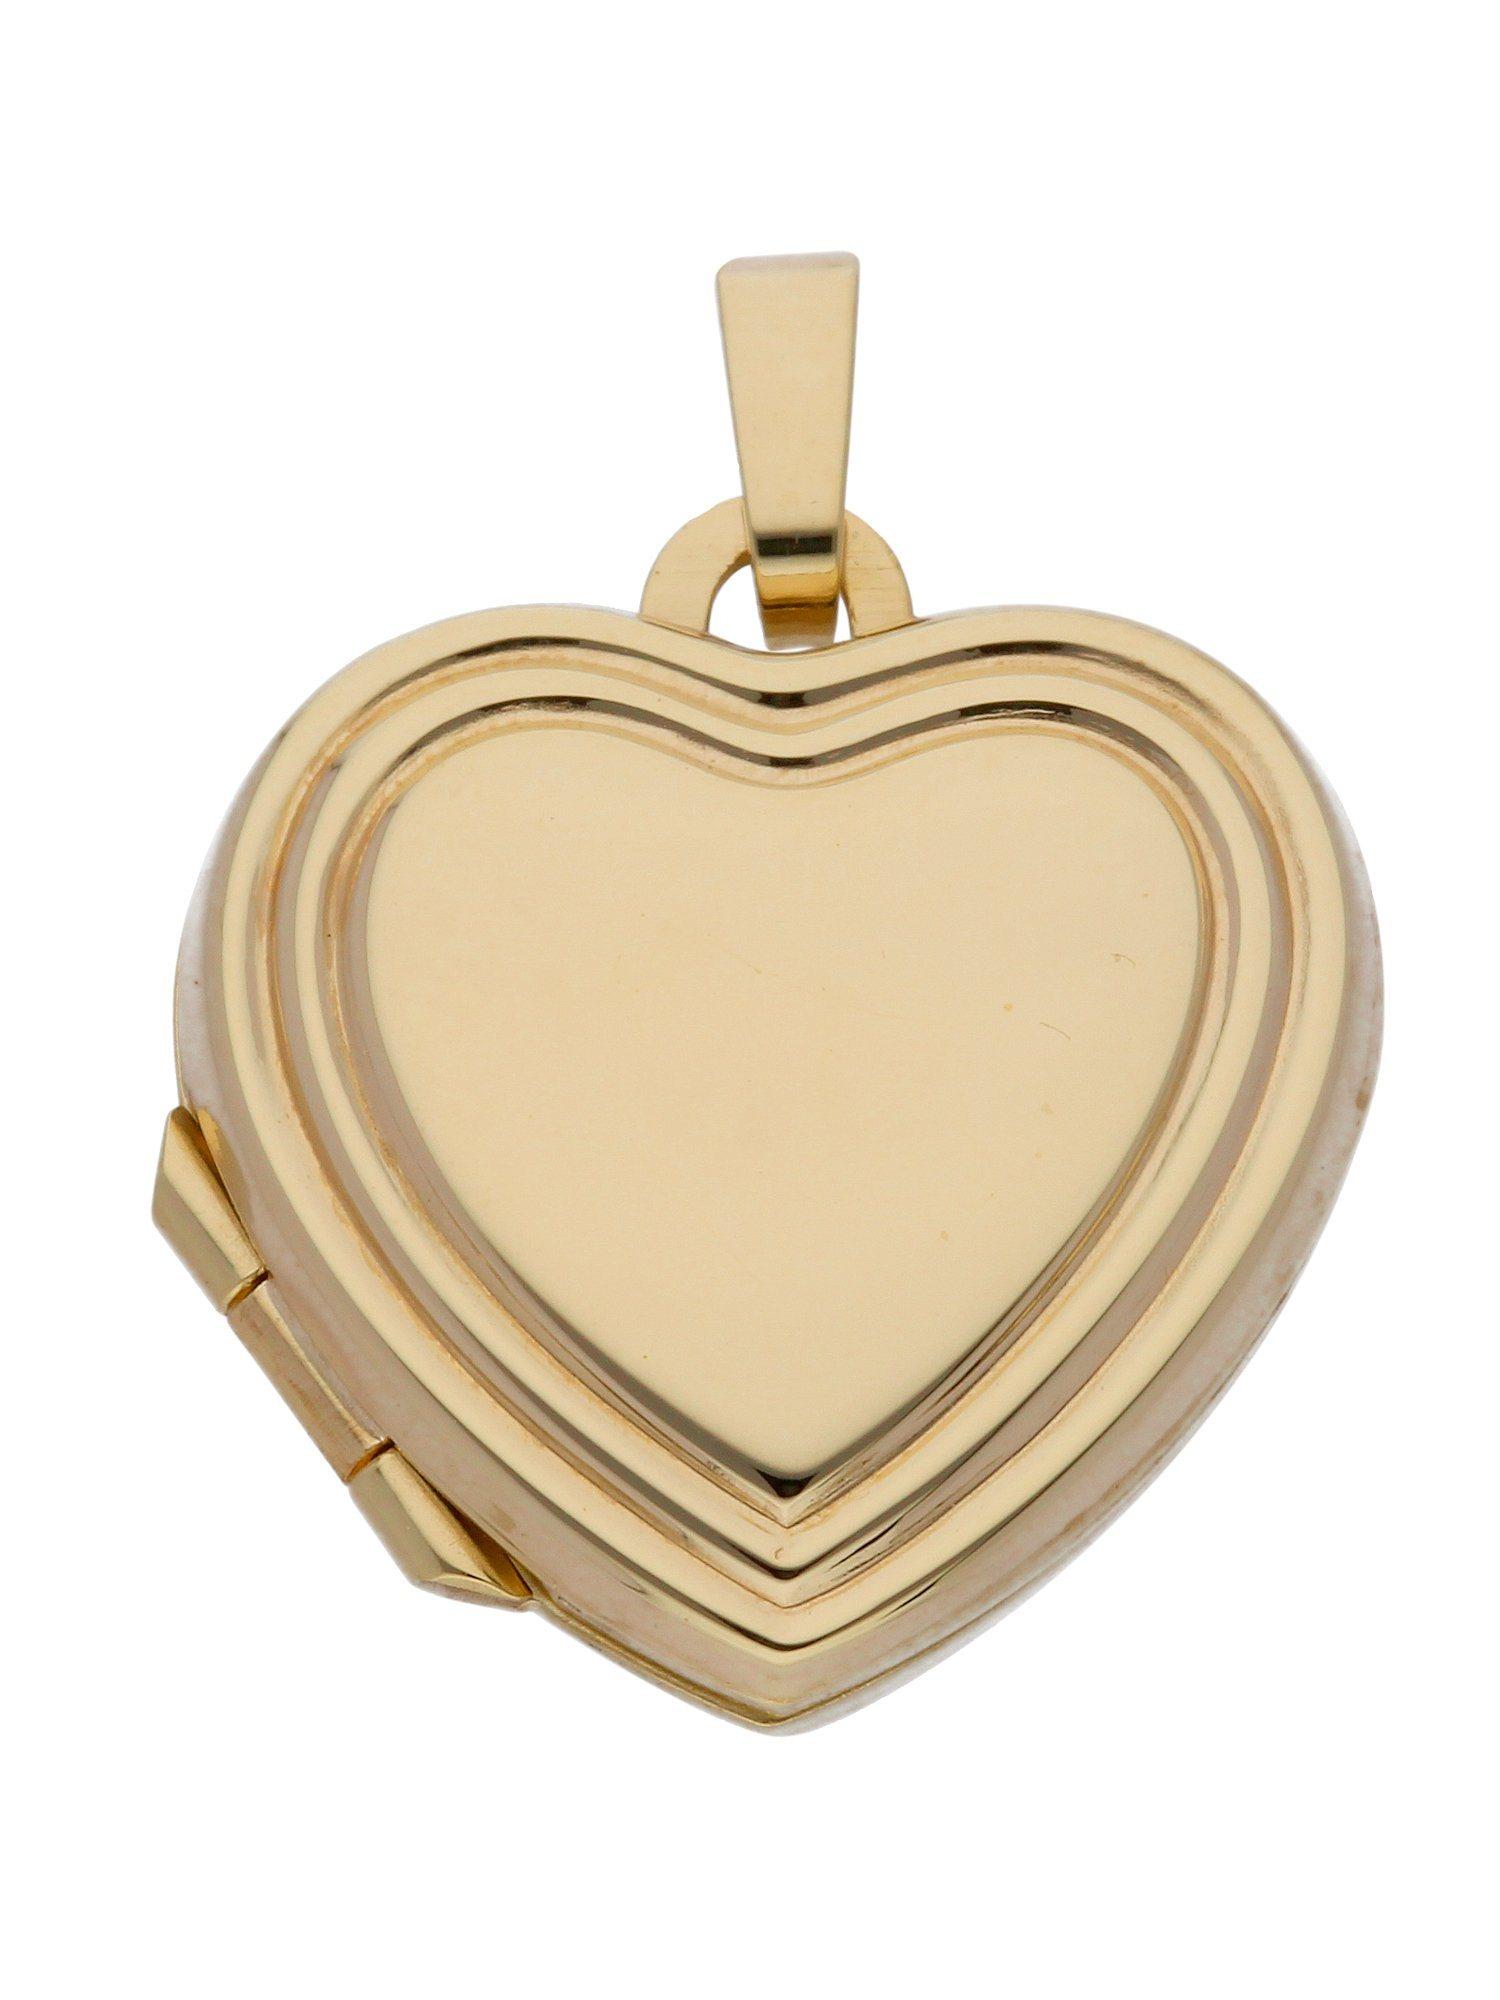 Adelia´s Kettenanhänger »Medaillon Gold Anhänger« 8 k 333 Gelbgold   Schmuck > Halsketten > Ketten ohne Anhänger   Goldfarben   Adelia´s